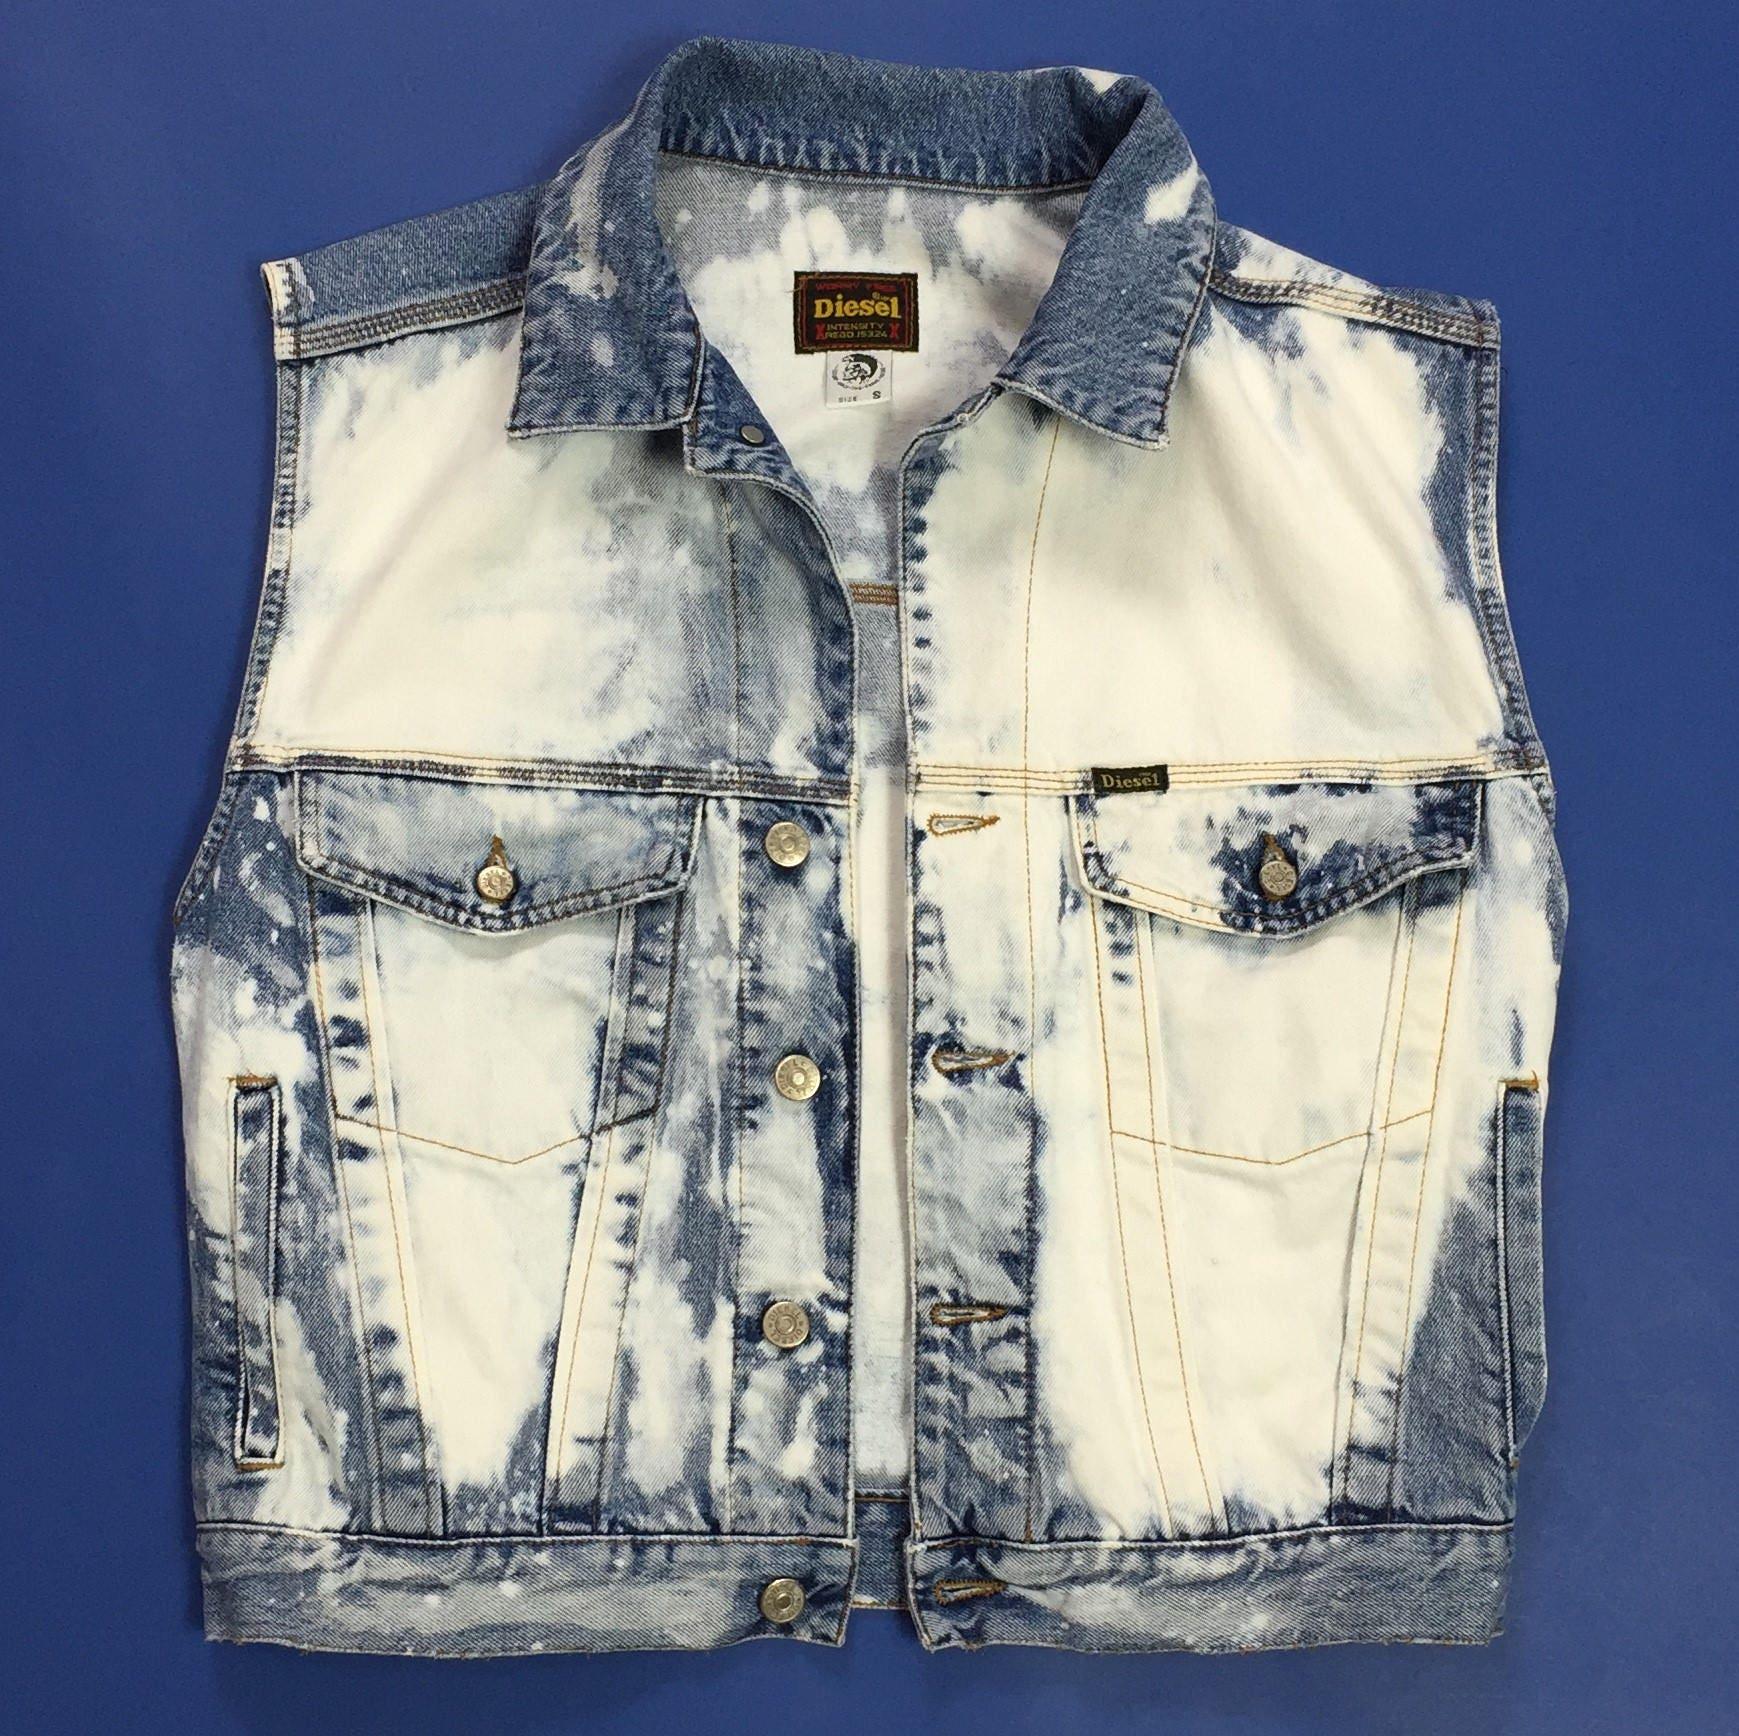 0080642d7b Diesel jeans smanicato S blu giubbino jacket denim usato hot   Etsy